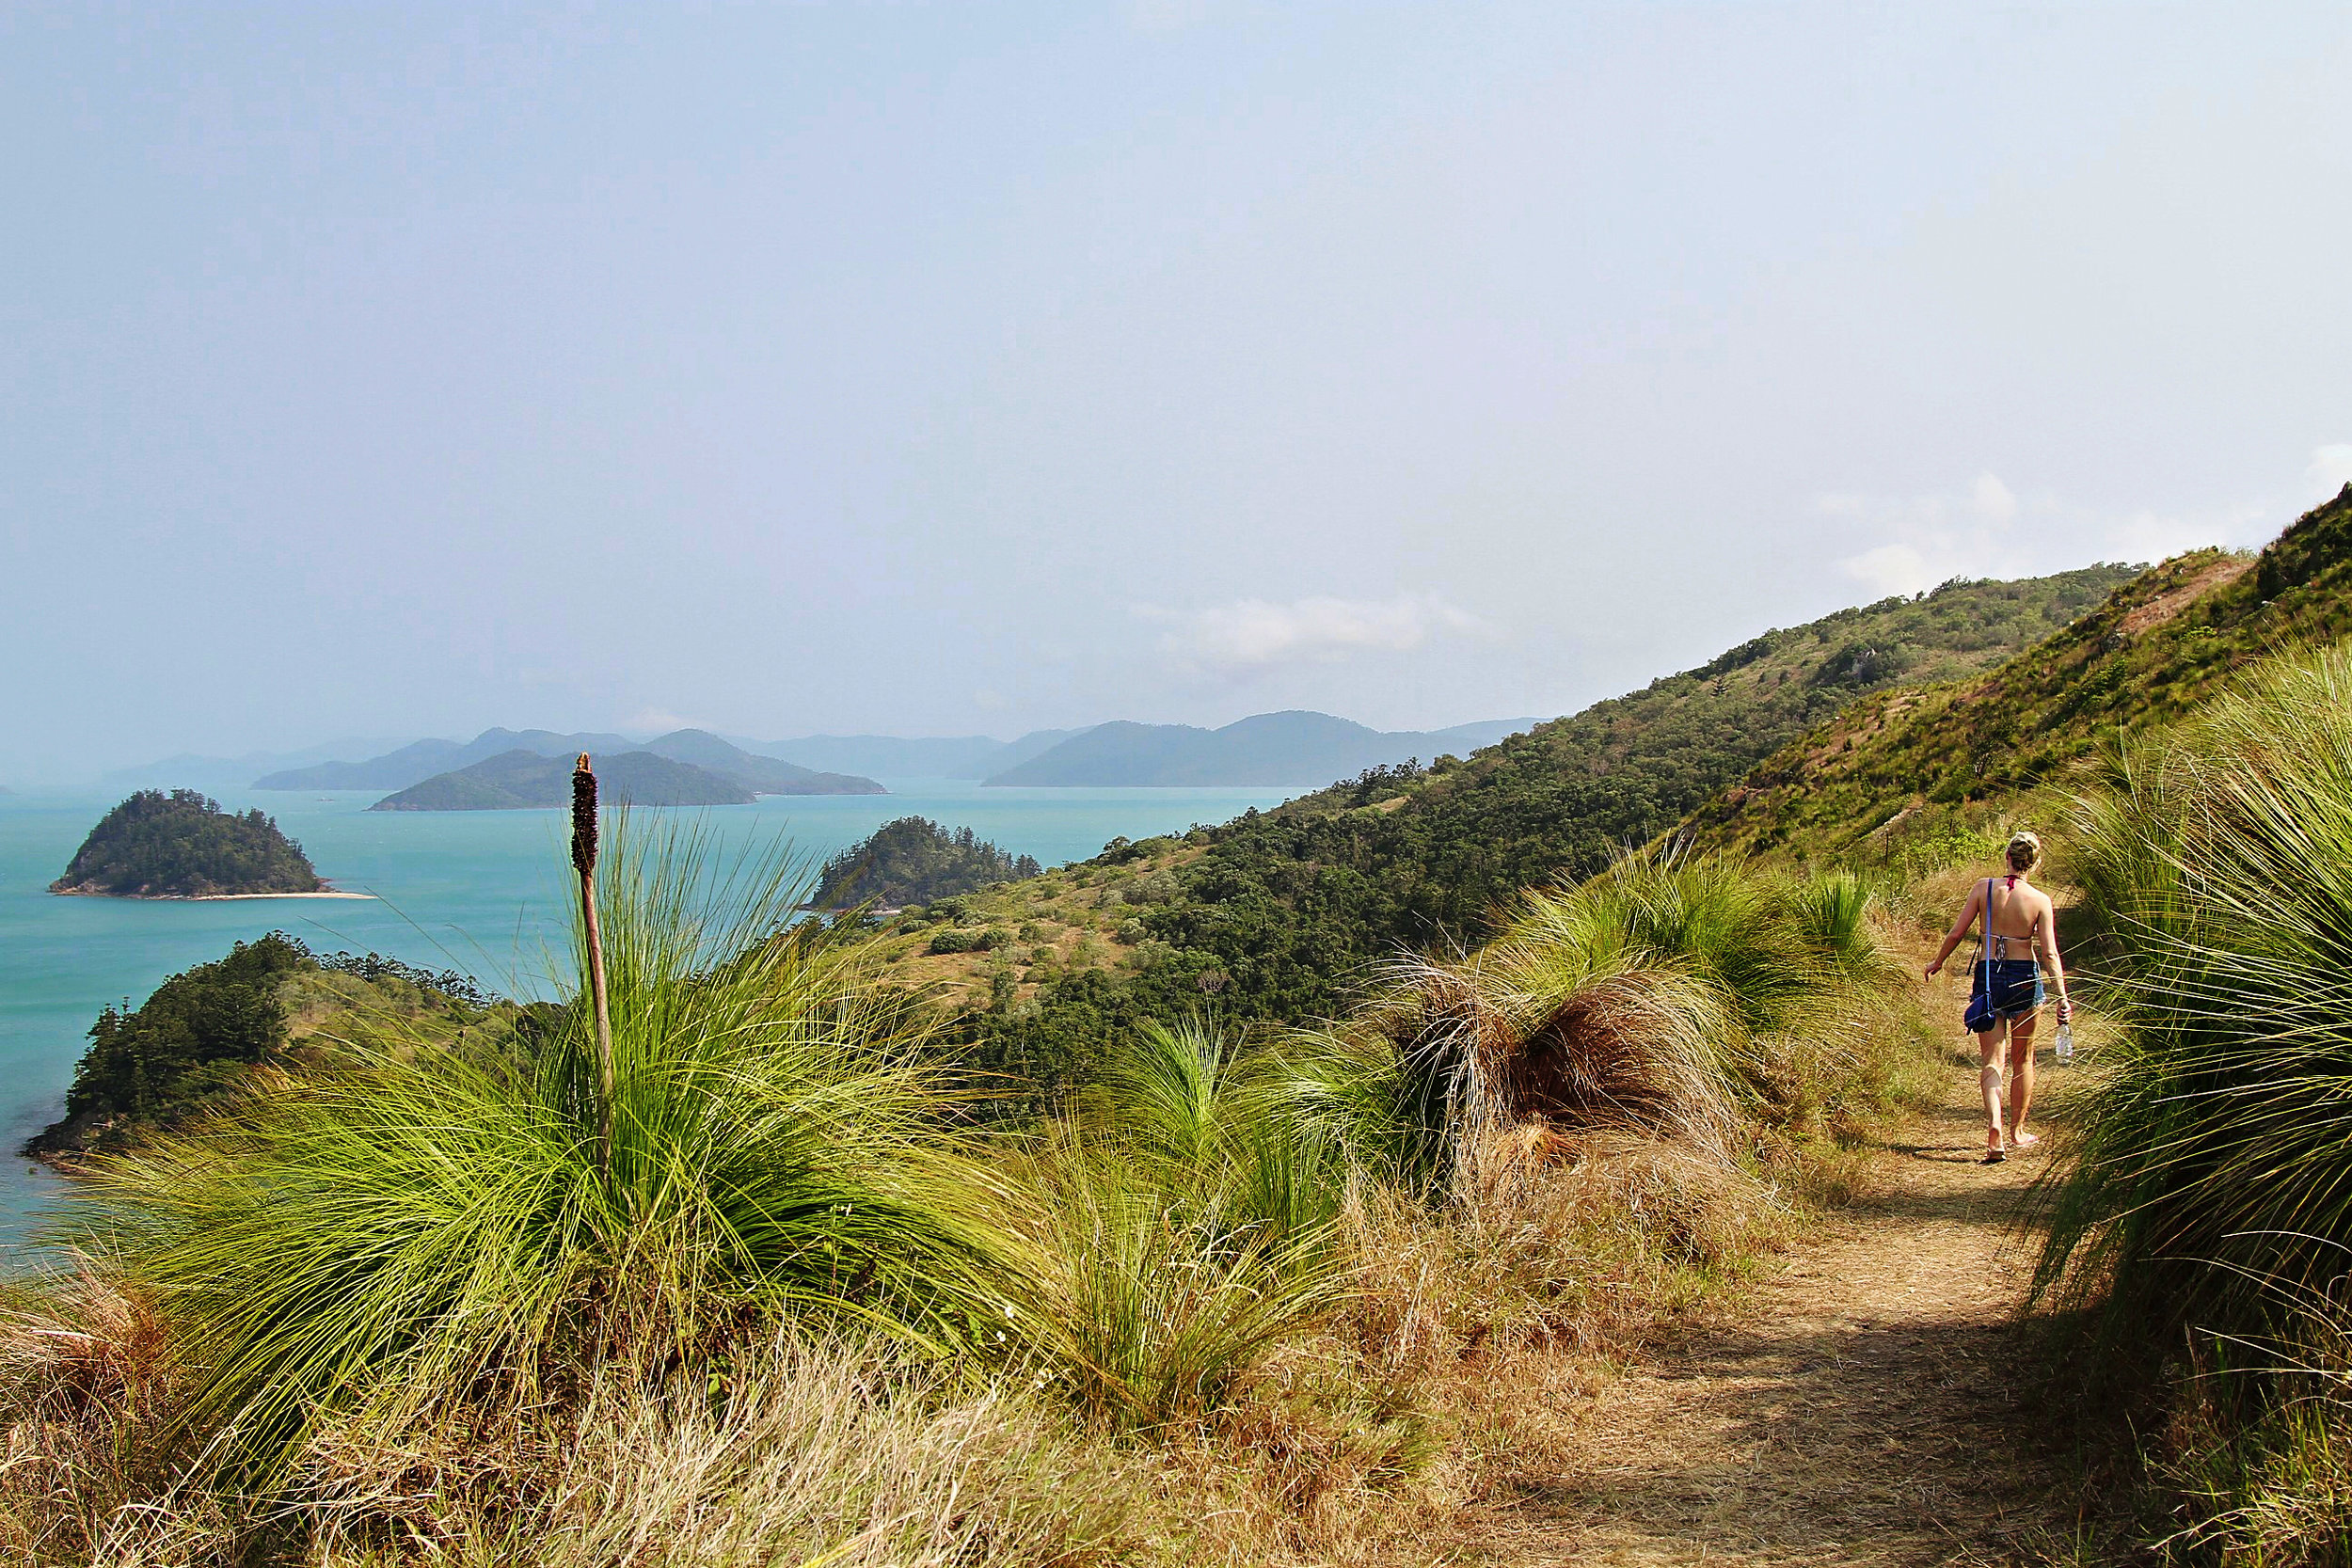 7.South_Molle_Is_Island_views.jpg